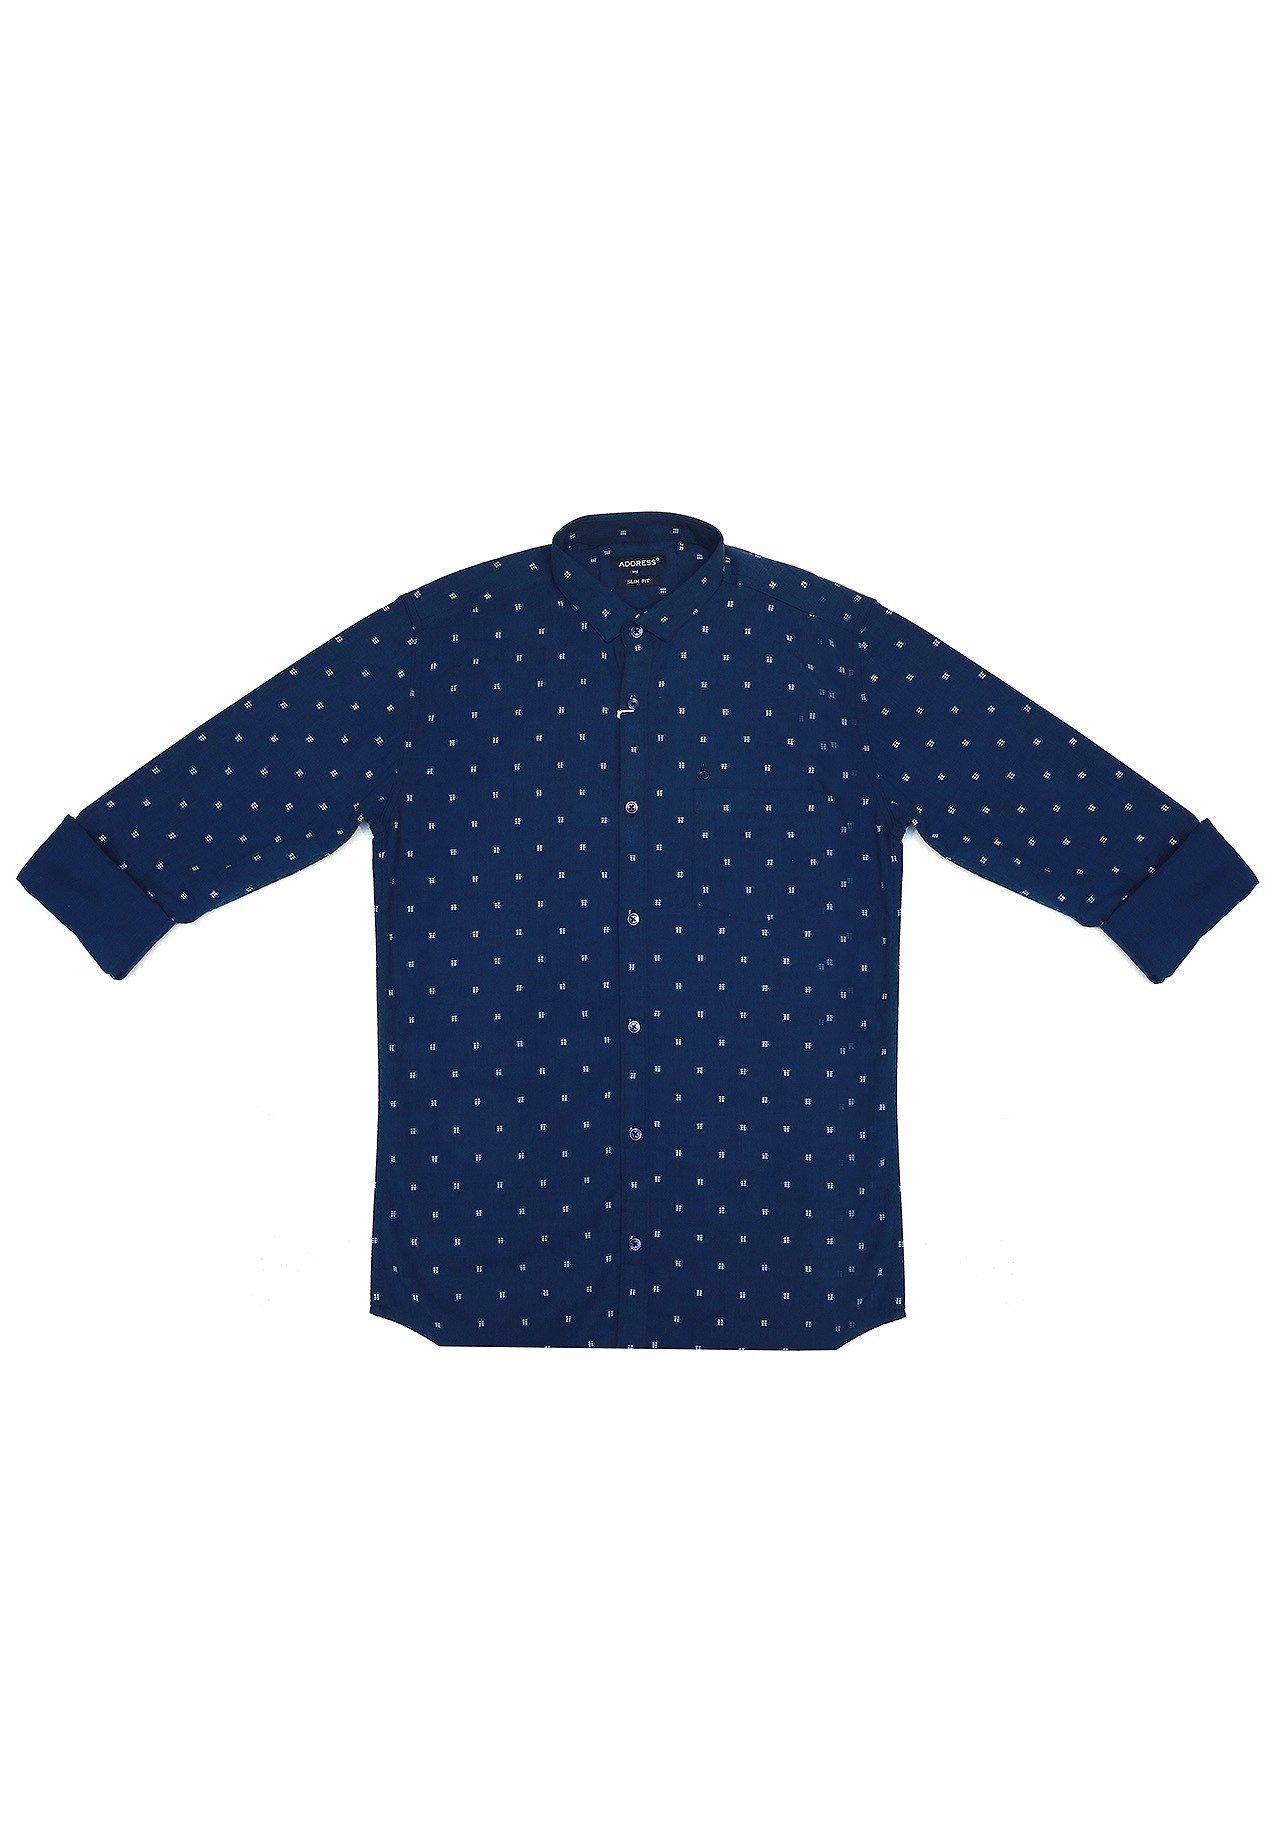 Address Casual Shirt Blue With Dots Slim Fit, AC19JU 9572 B